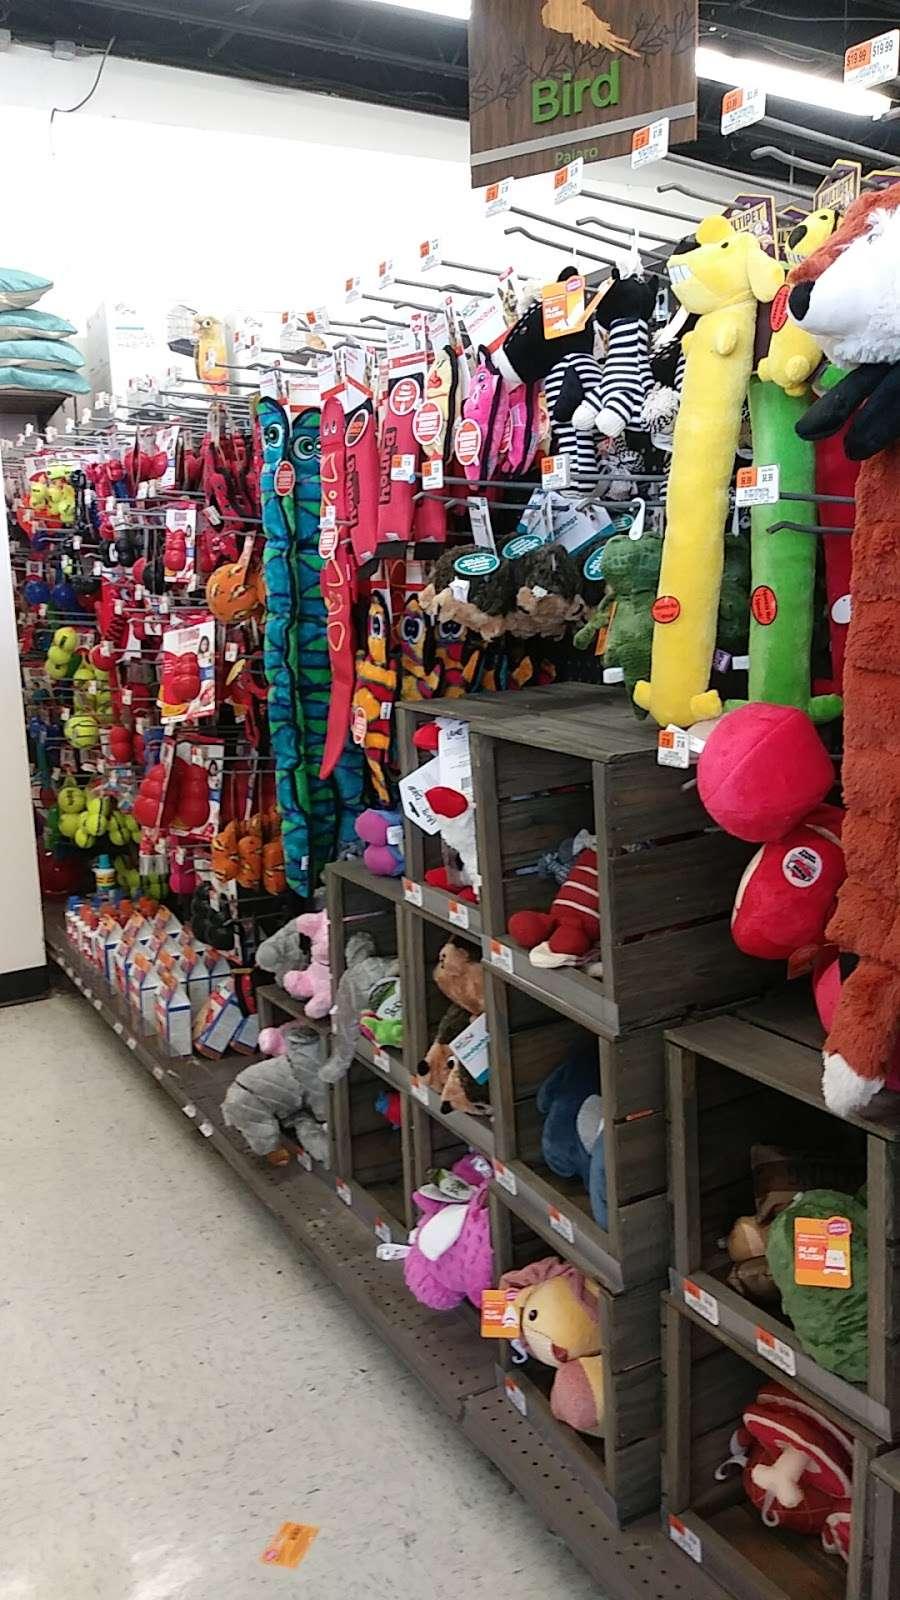 Petco Animal Supplies - store    Photo 4 of 10   Address: 780 Rte 3 West, Clifton, NJ 07012, USA   Phone: (973) 472-3344